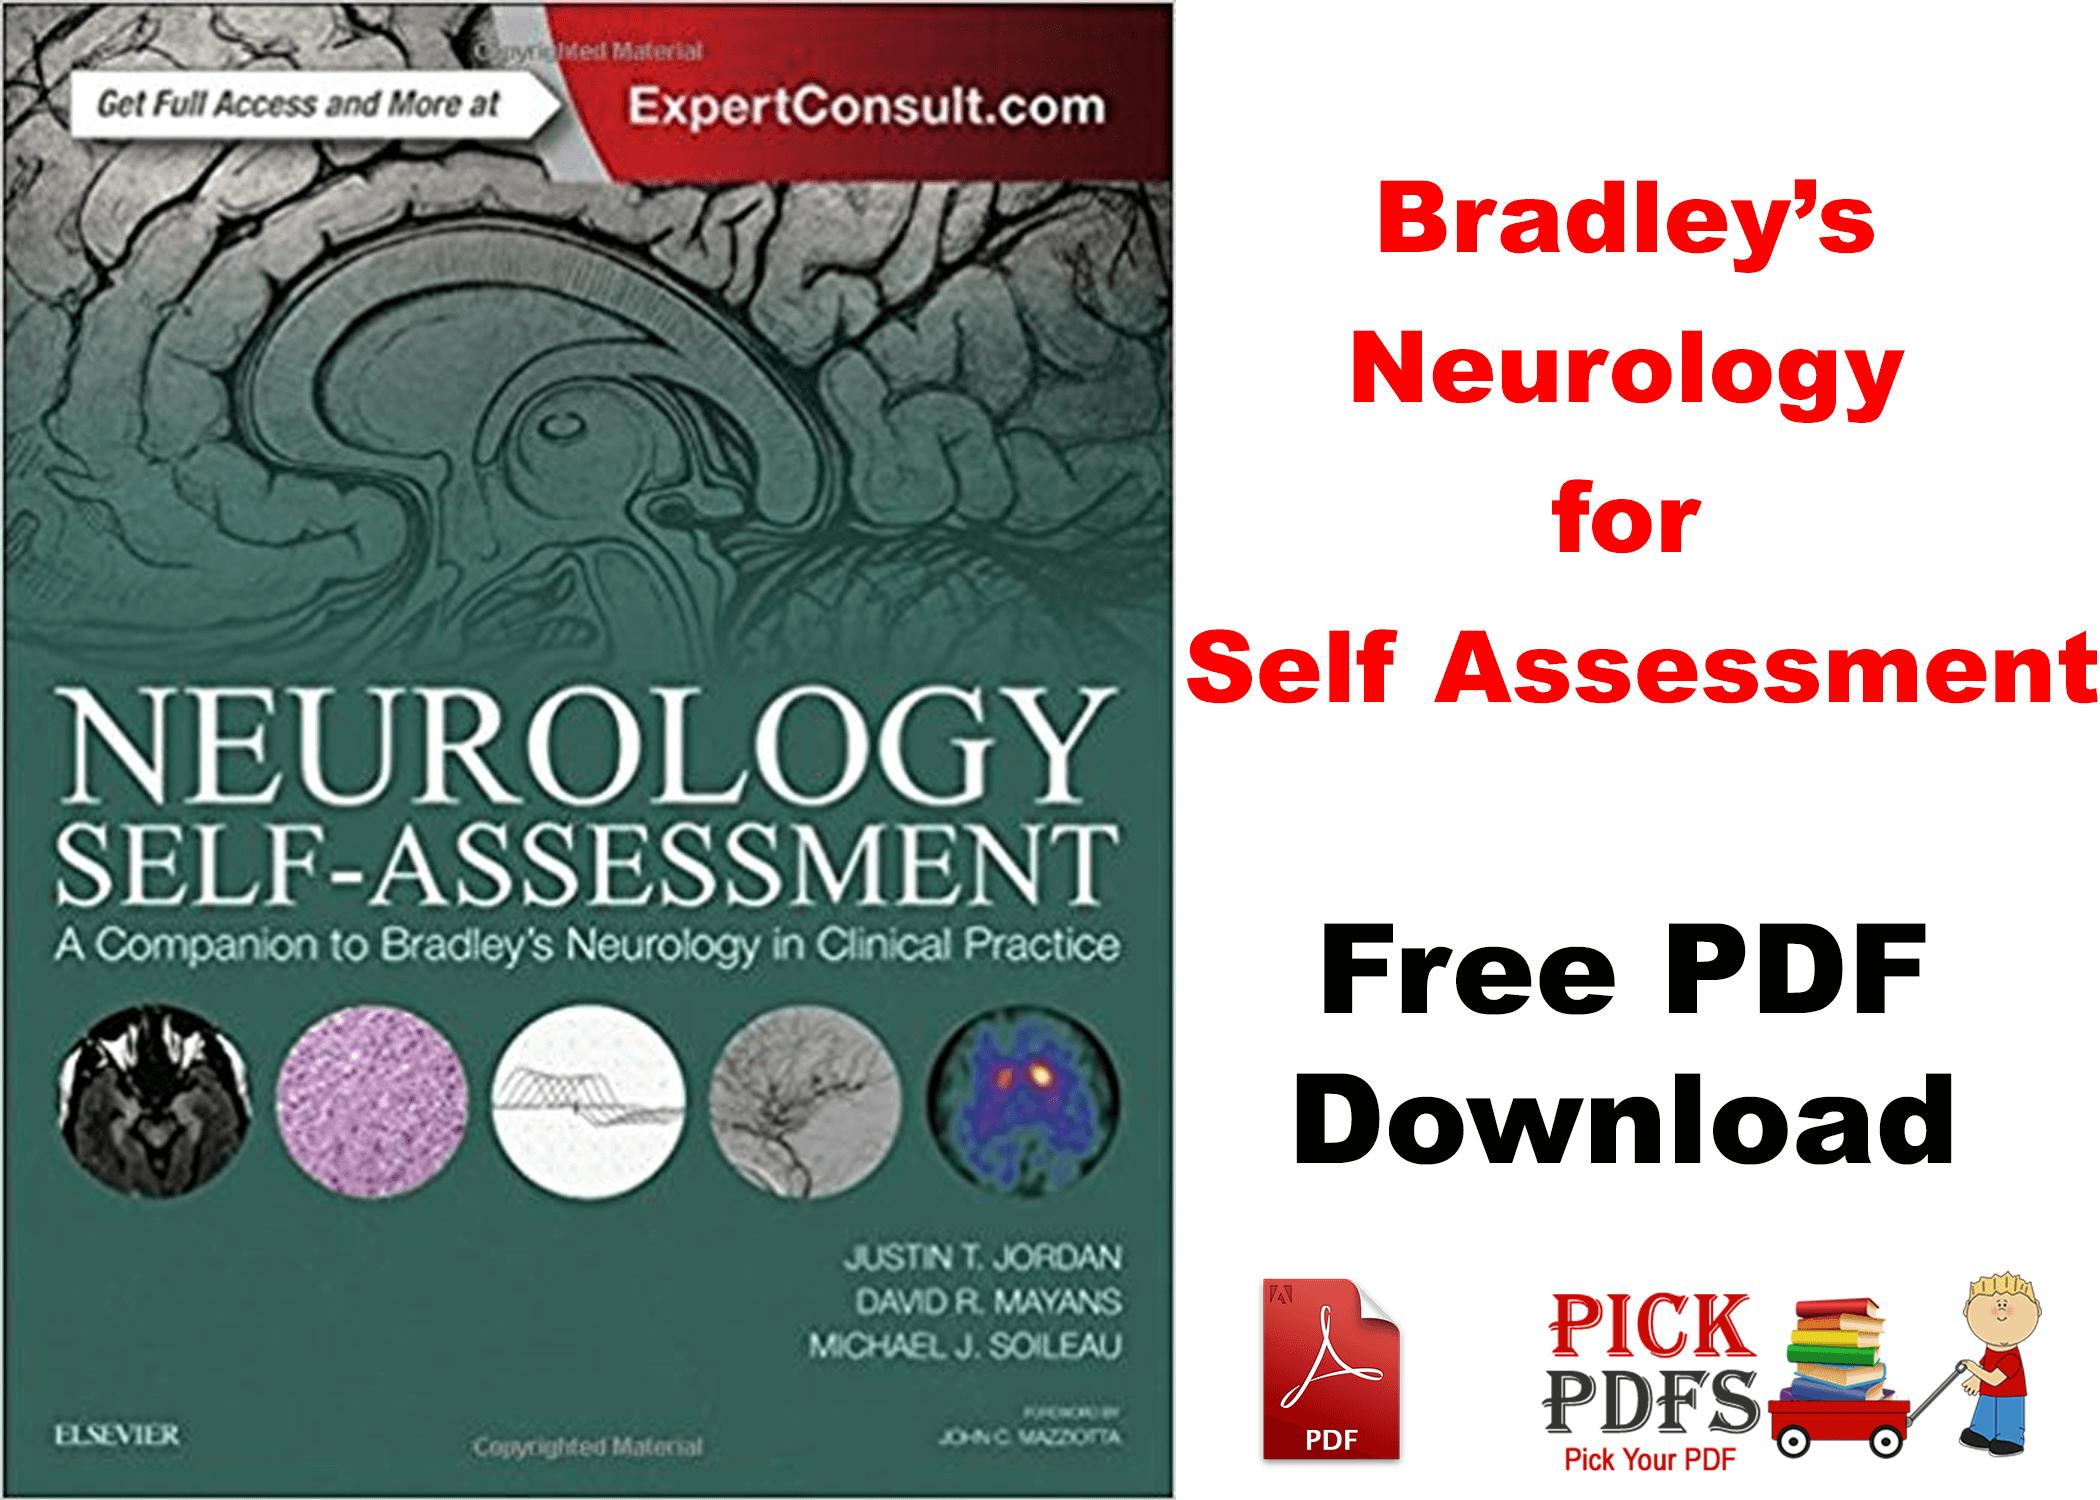 https://pickpdfs.com/bradleys-neurology-for-self-assessment-free-pdf-book-download/